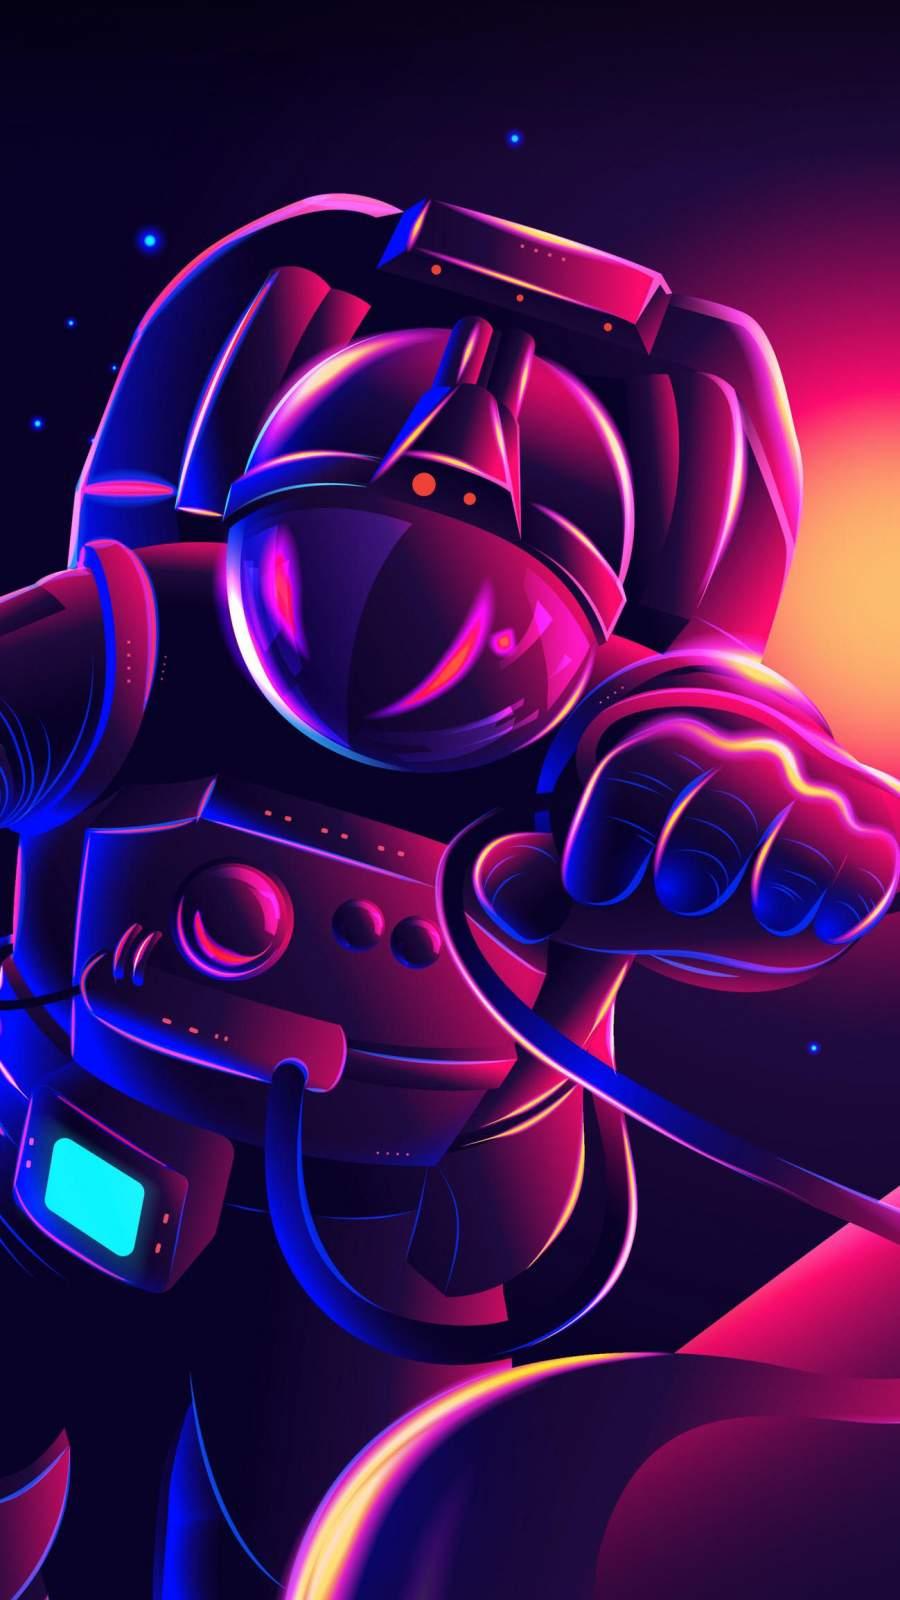 Space Explorer Art iPhone Wallpaper